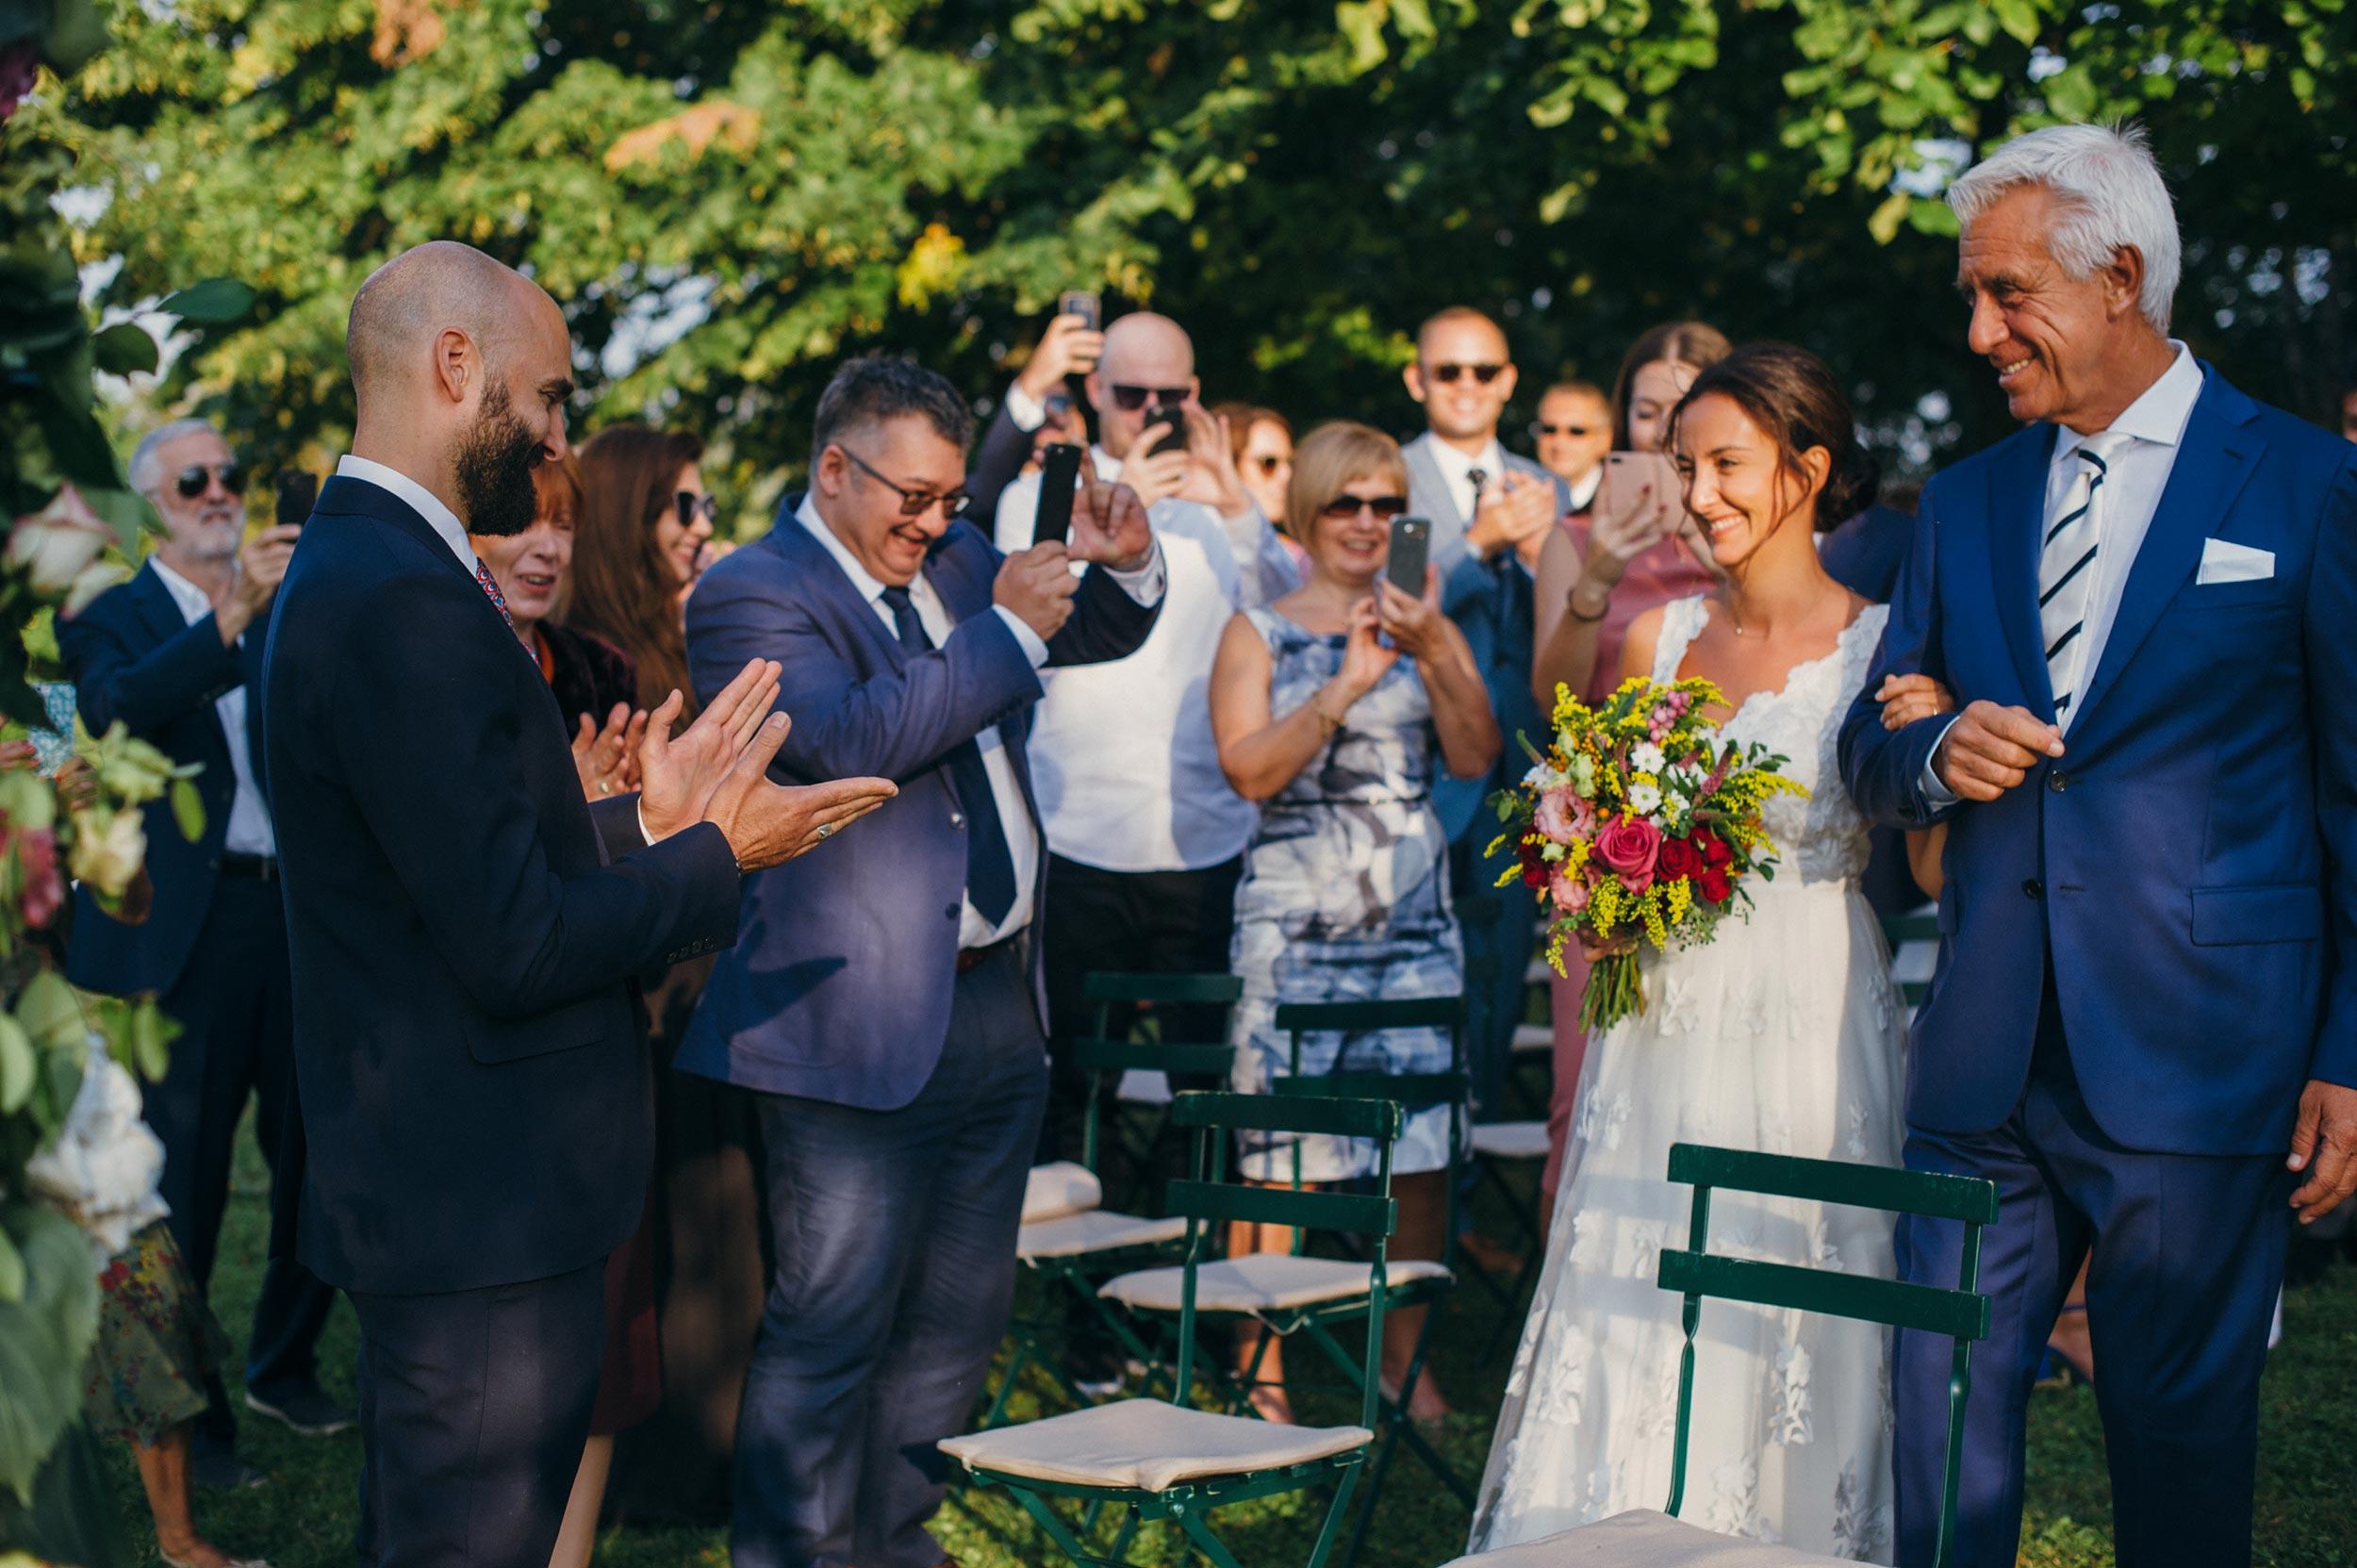 2016-Davor-Chiara-Monferrato-Asti-Vercelli-Wedding-Photographer-Italy-Alessandro-Avenali-29.jpg